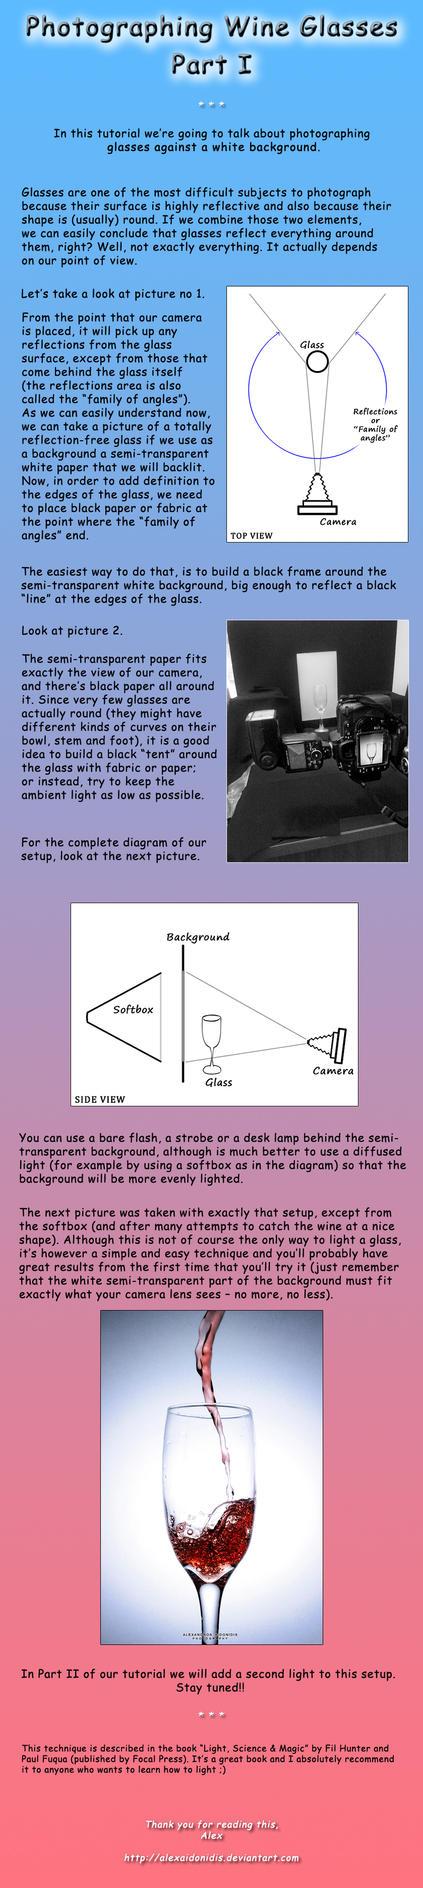 Tutorial - Photographing Wine Glasses - Part I by AlexAidonidis